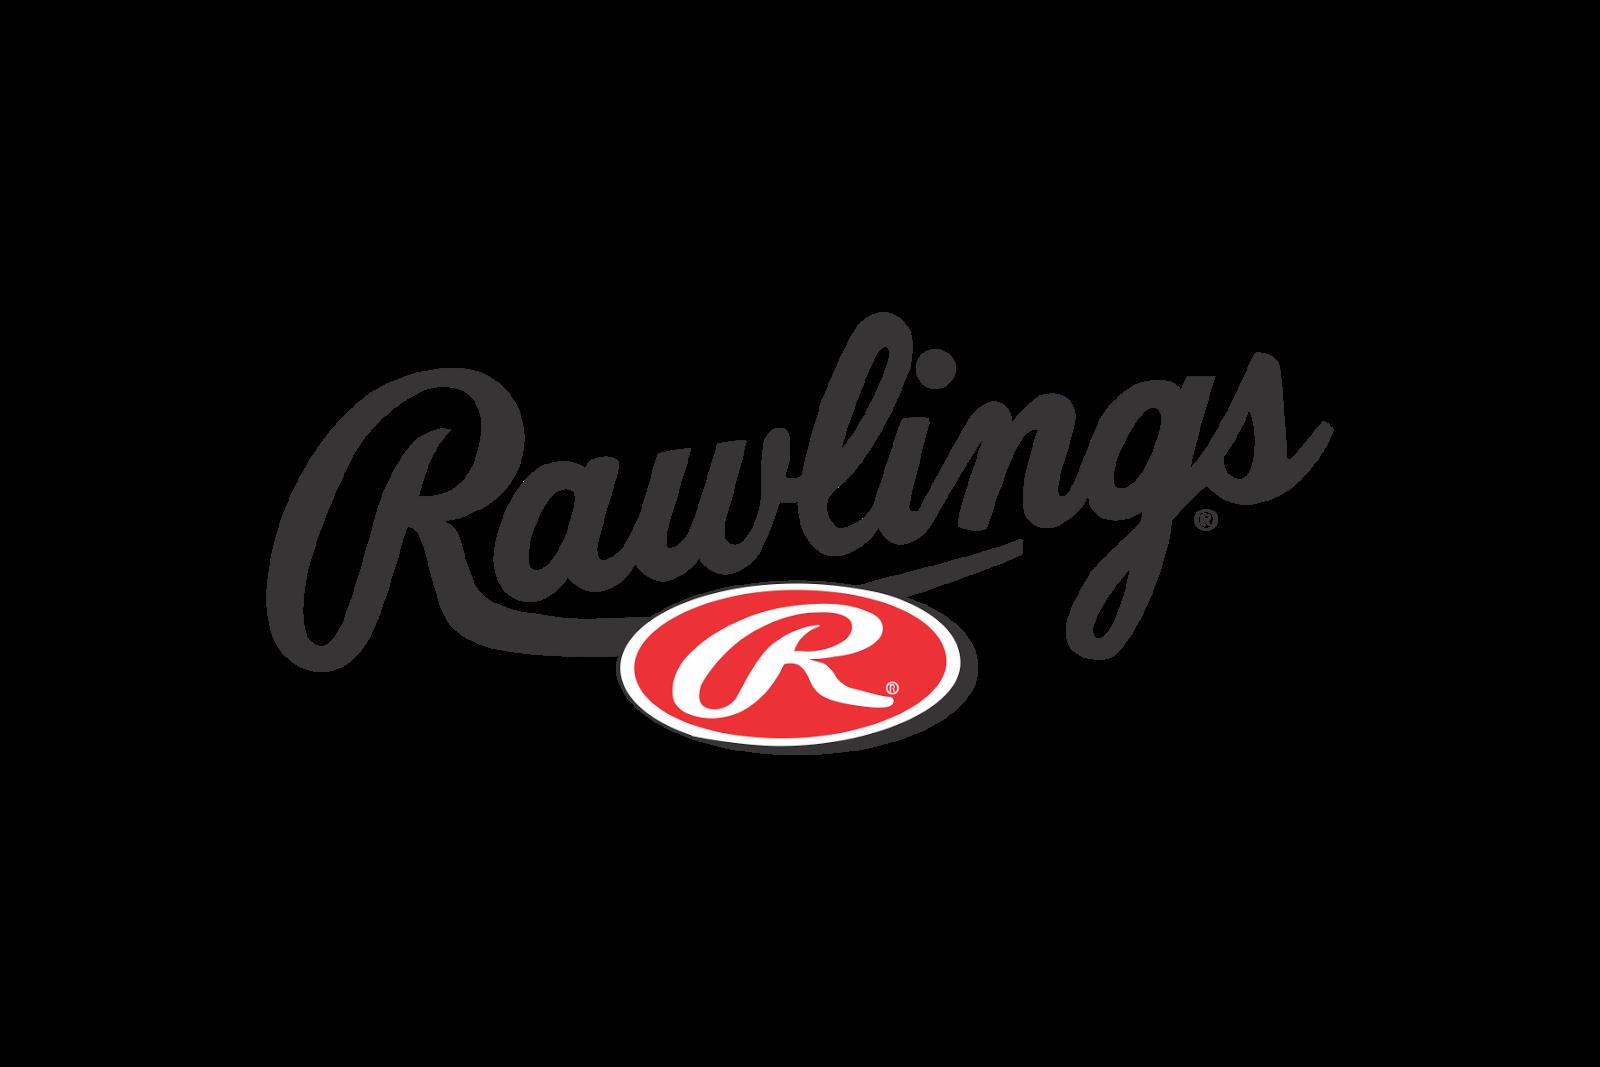 Logo Rawlings.png